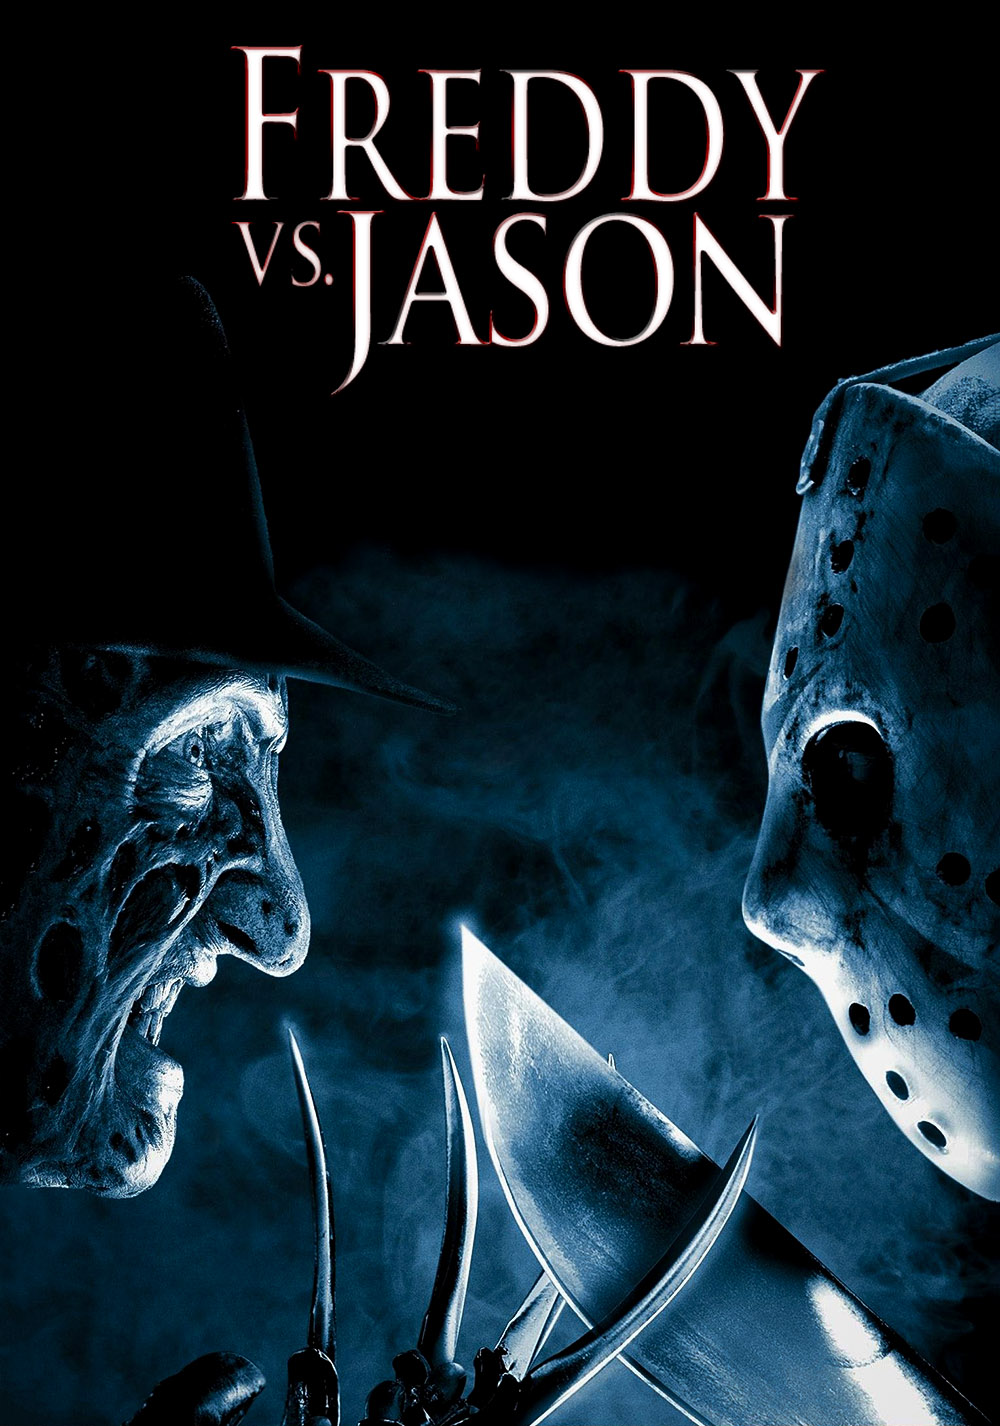 Freddy-vs.-Jason-2003-movie-poster.jpg